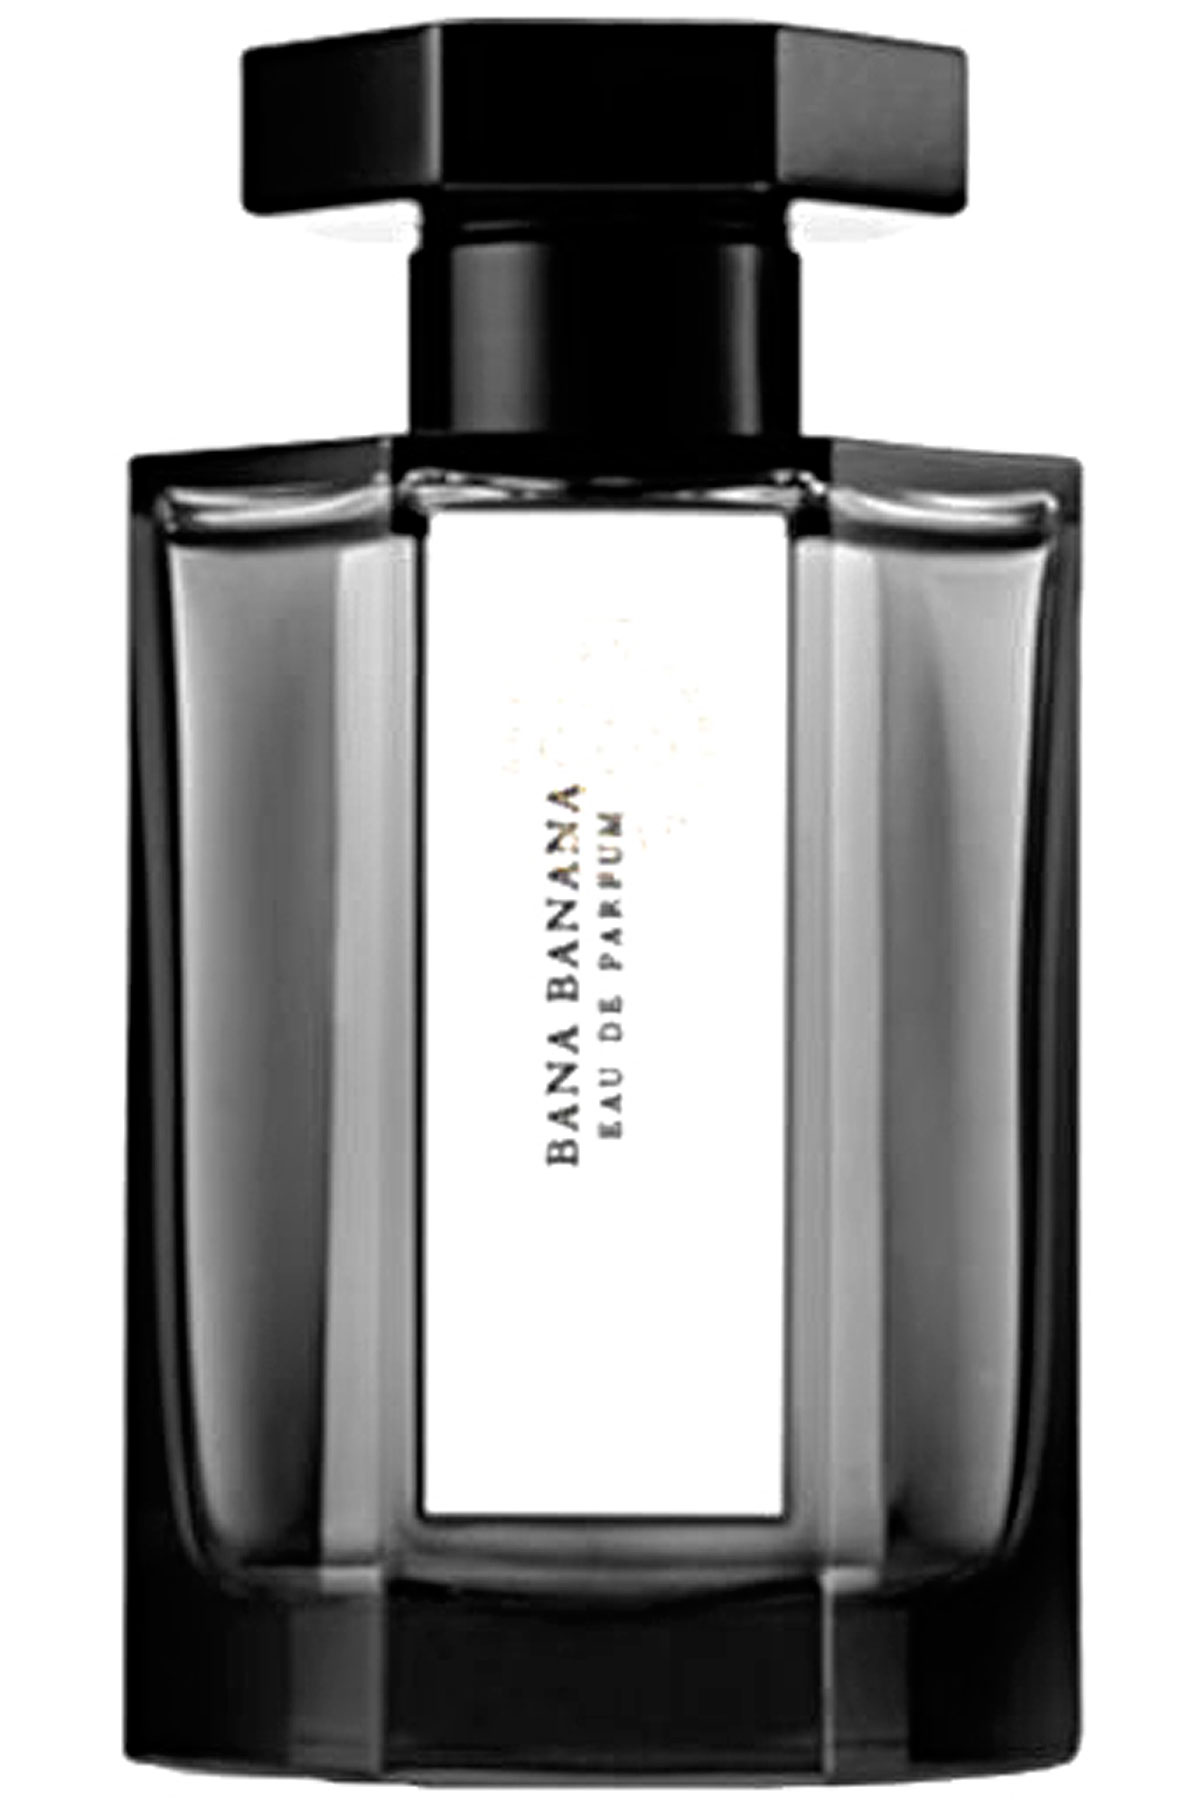 Artisan Parfumeur Fragrances for Women, Bana Banana - Eau De Parfum - 100 Ml, 2019, 100 ml